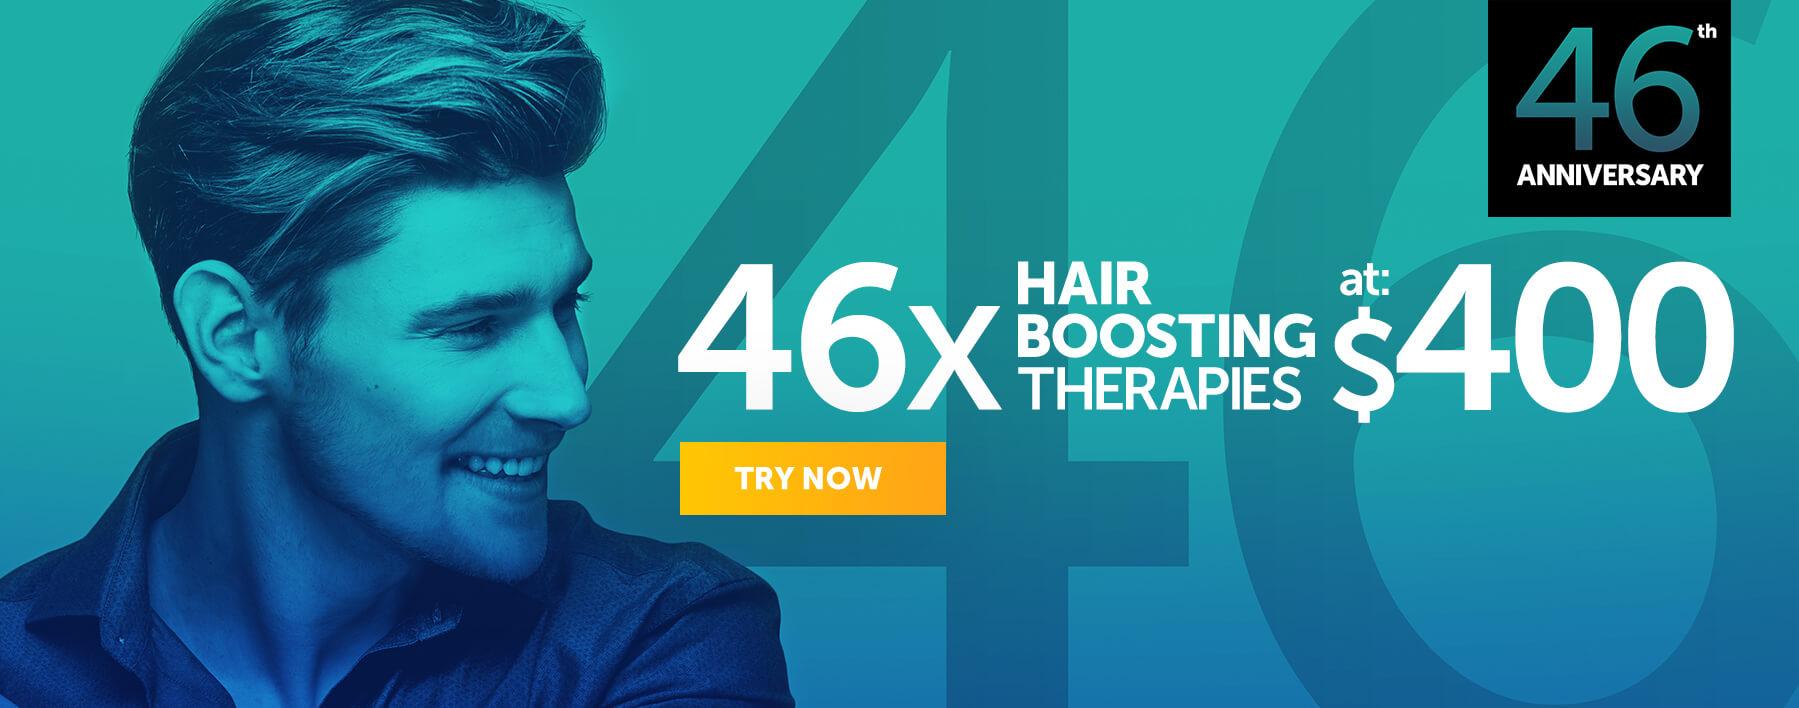 46 Hair Boosting Therapies at $400